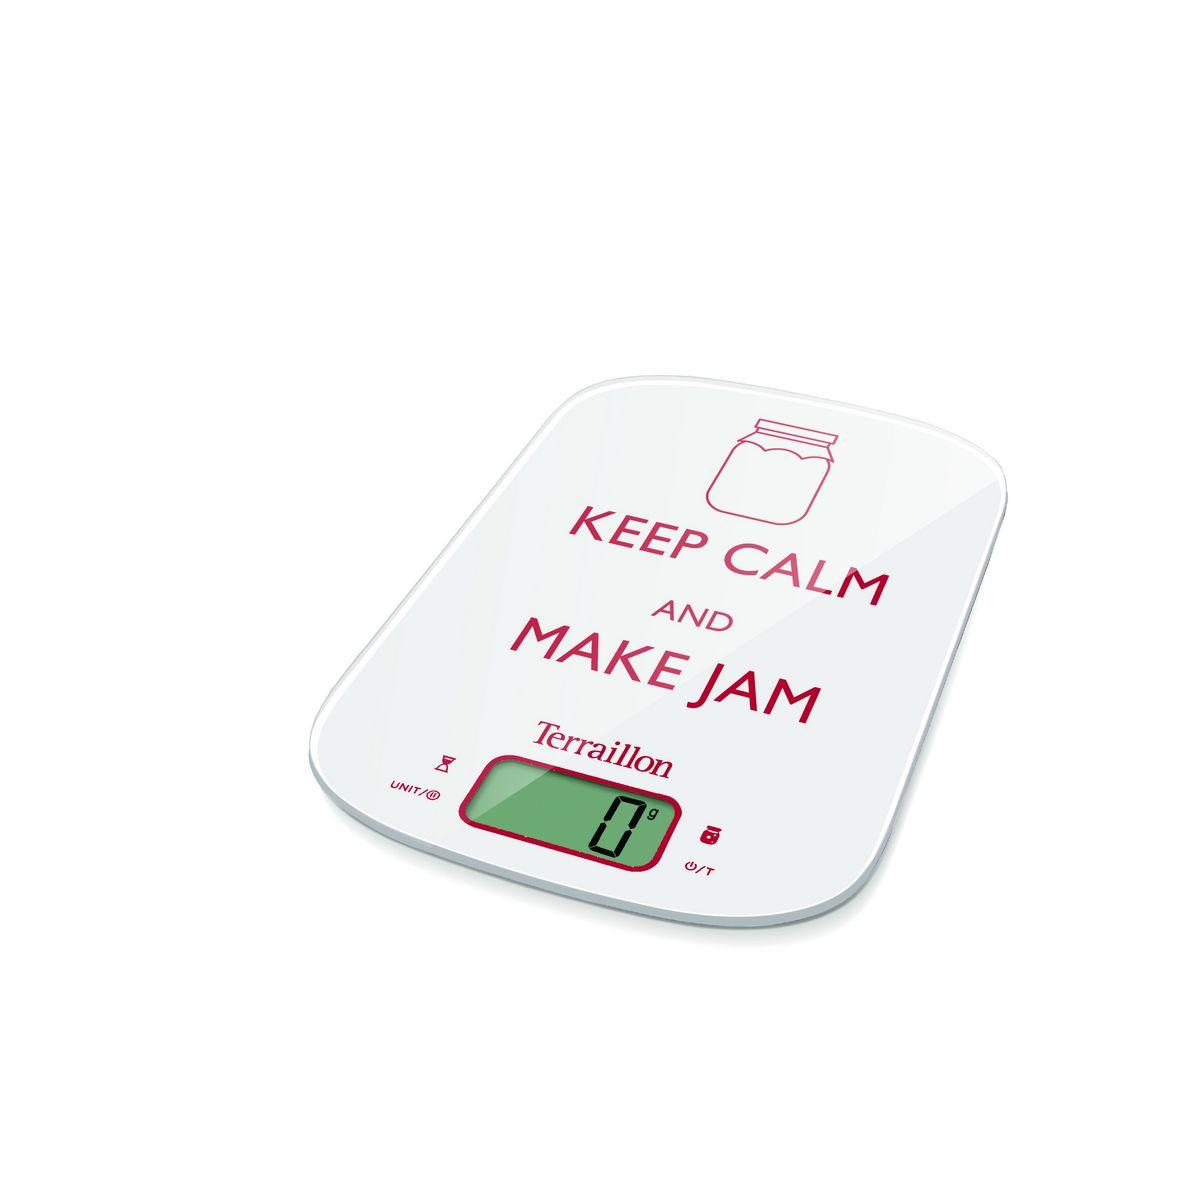 Balance de cuisine Neocook Jam Keepcalm - KEA72210W - Blanc